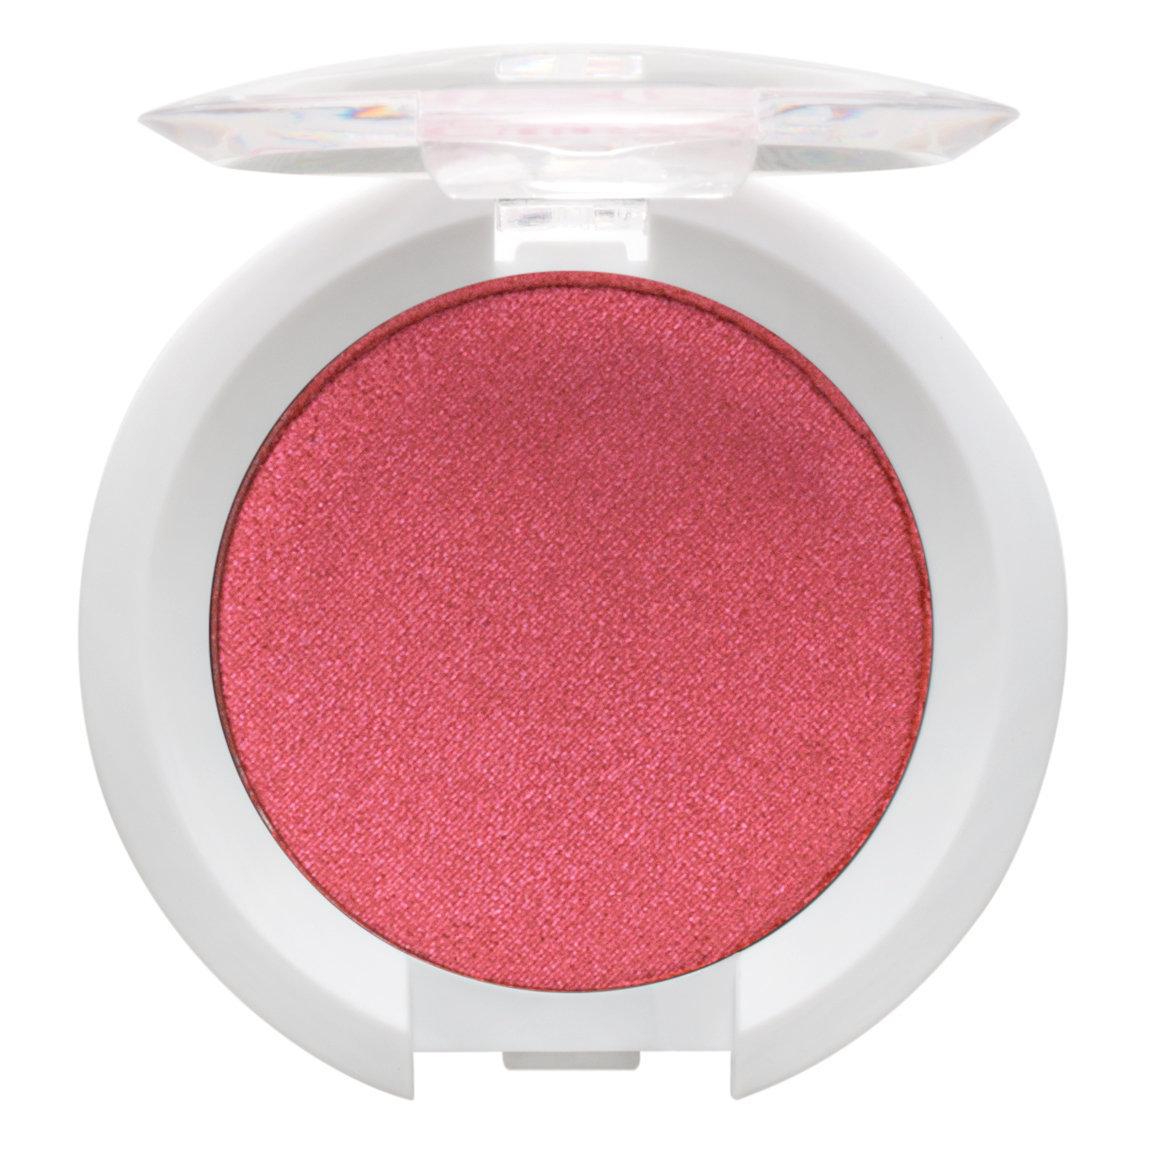 Sugarpill Cosmetics Pressed Eyeshadow S.W.A.K. alternative view 1 - product swatch.